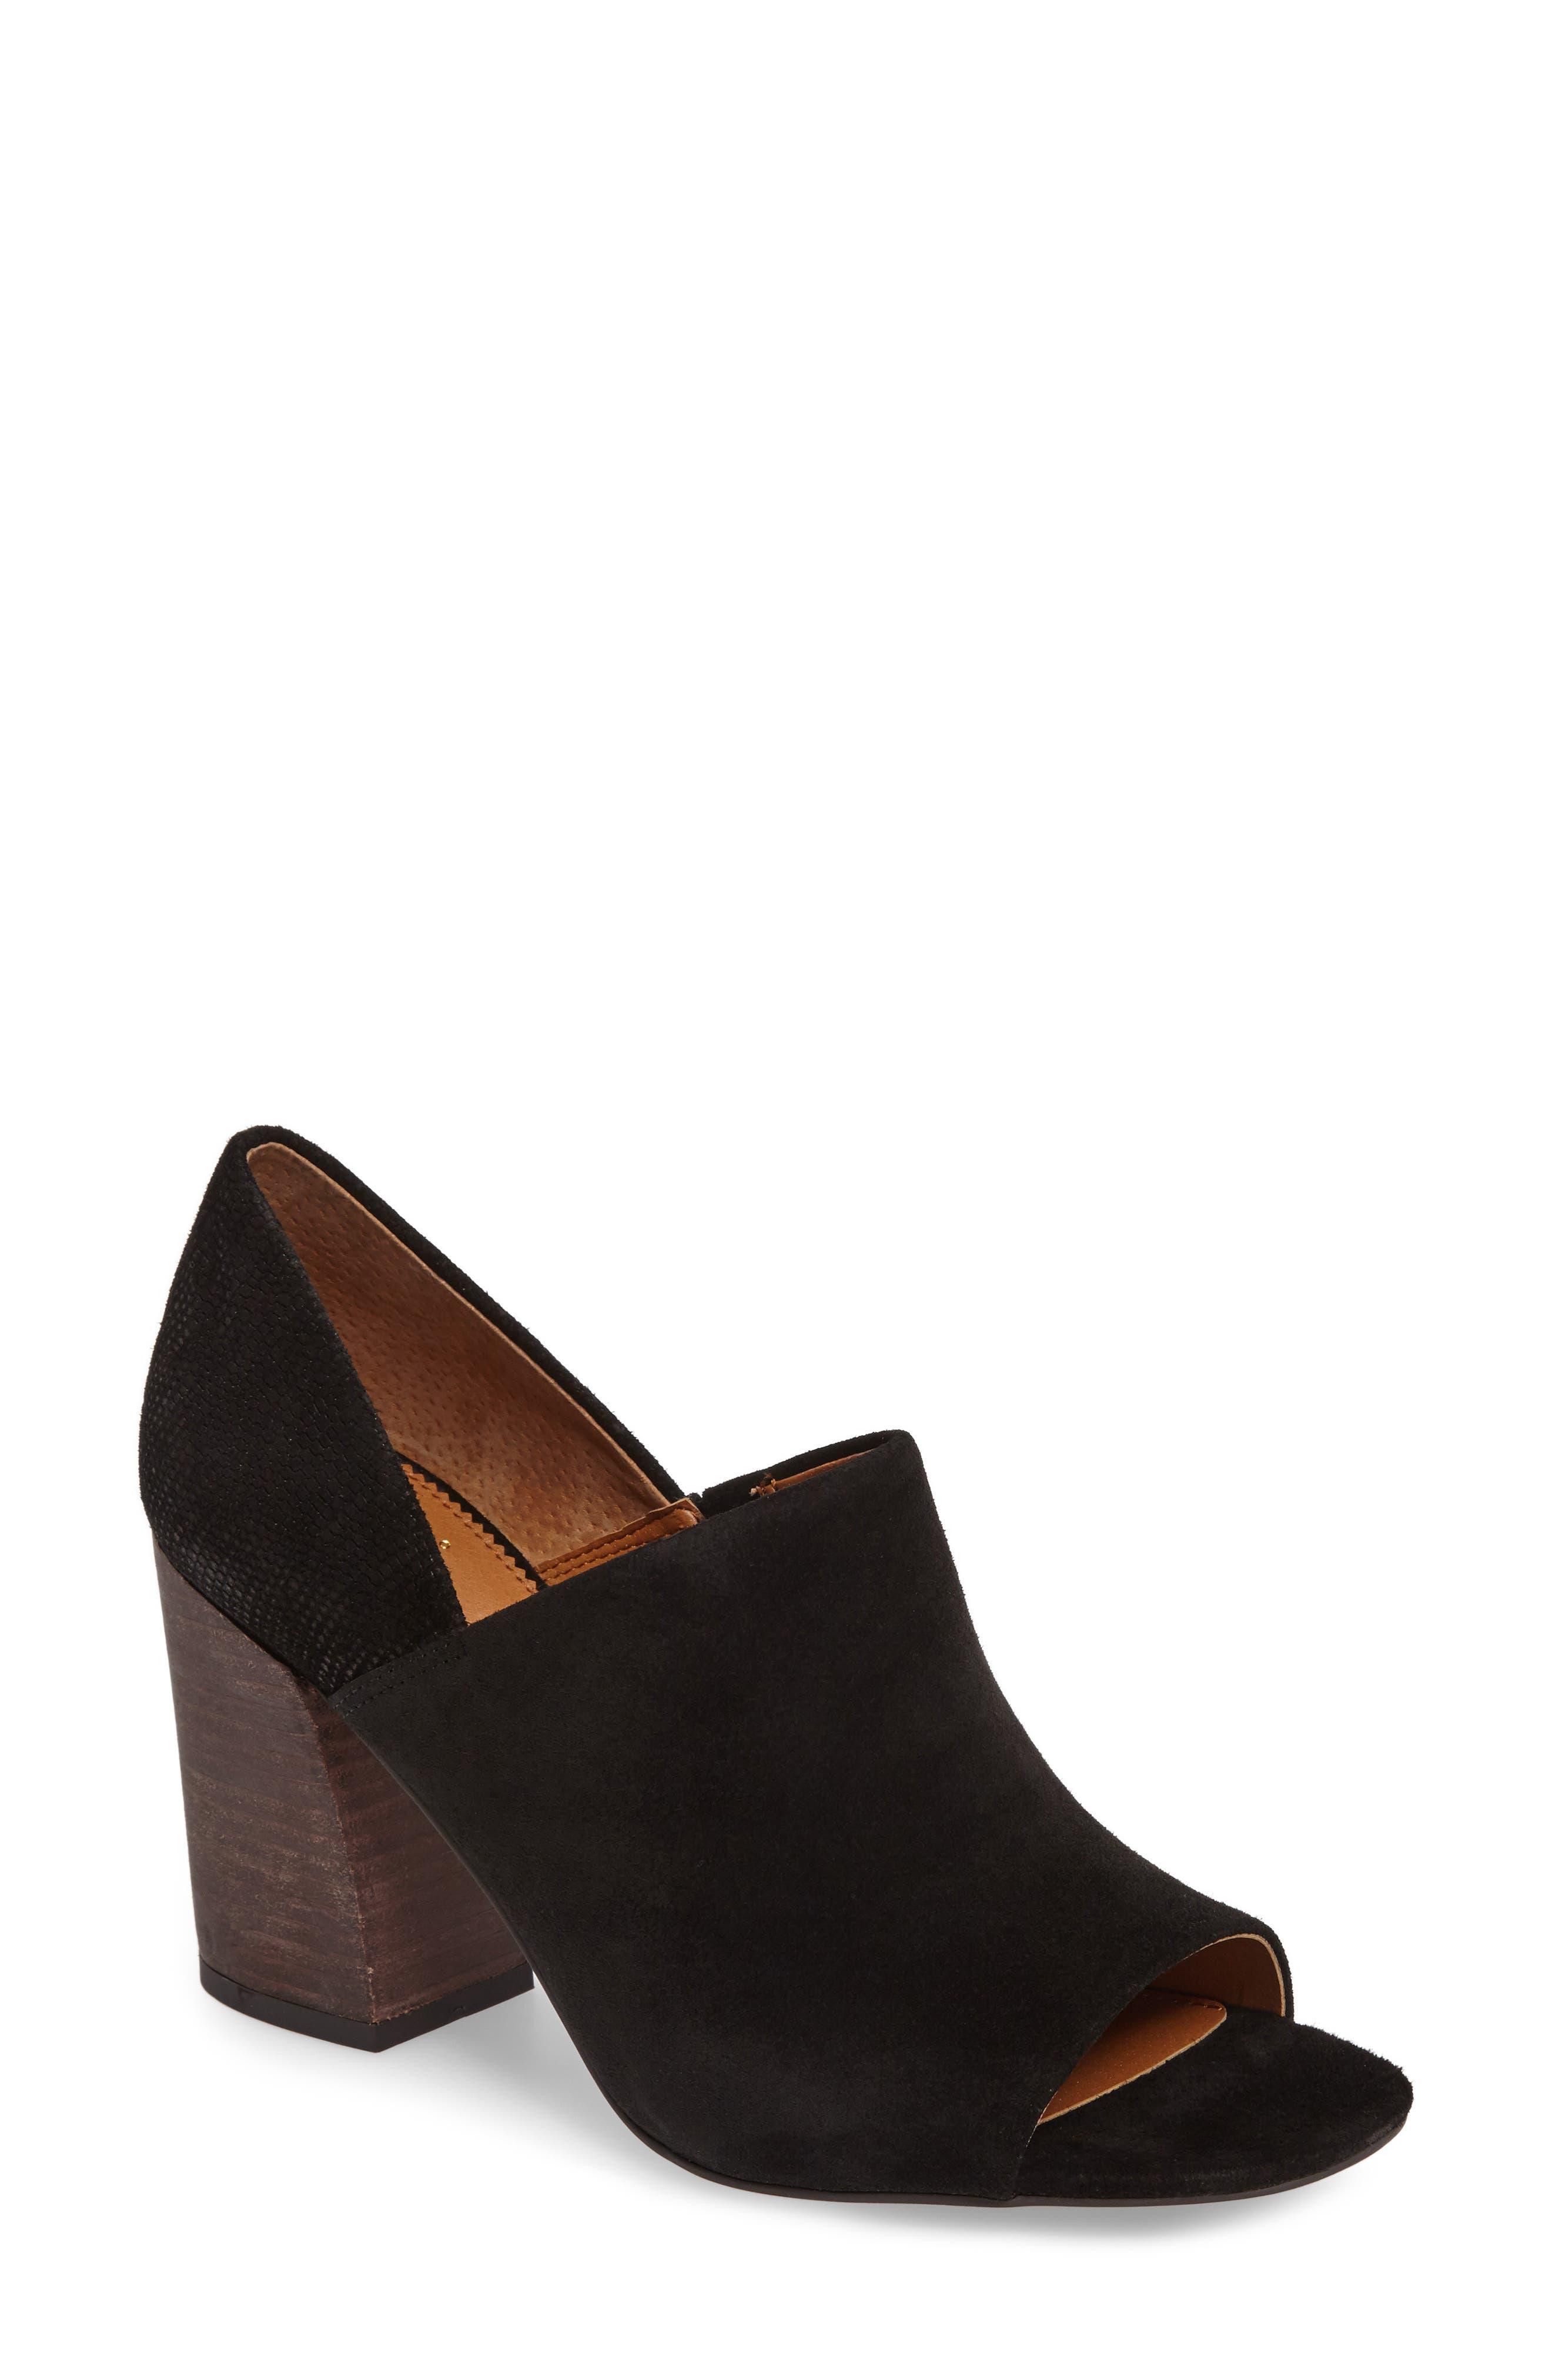 Ellison Block Heel Sandal,                         Main,                         color, 001